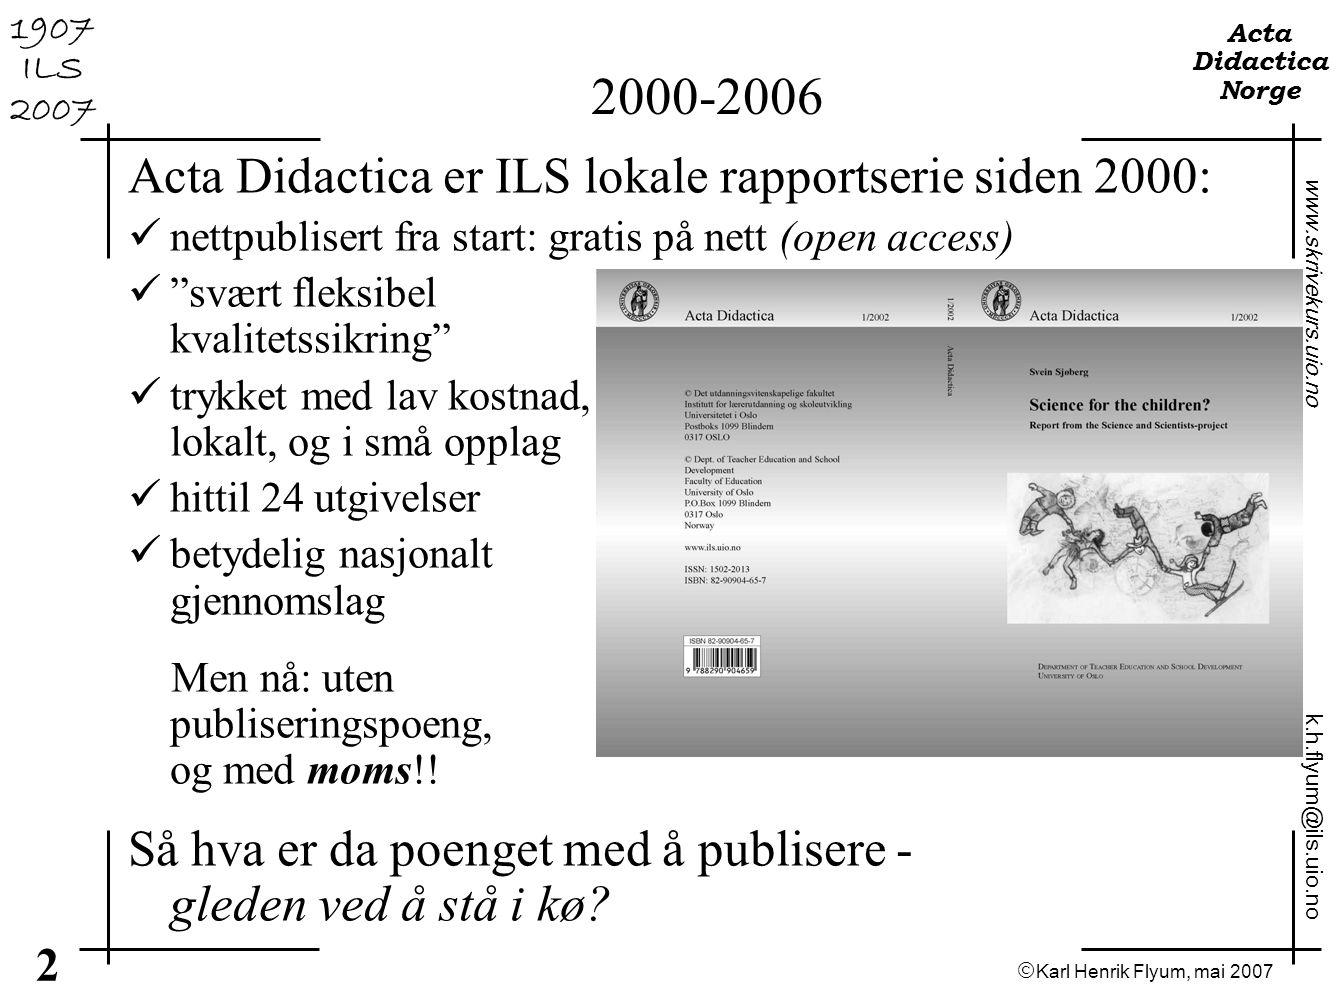  Karl Henrik Flyum, mai 2007 2 www.skrivekurs.uio.no k.h.flyum@ils.uio.no Acta Didactica Norge 1907 ILS 2007 2000-2006 Acta Didactica er ILS lokale r